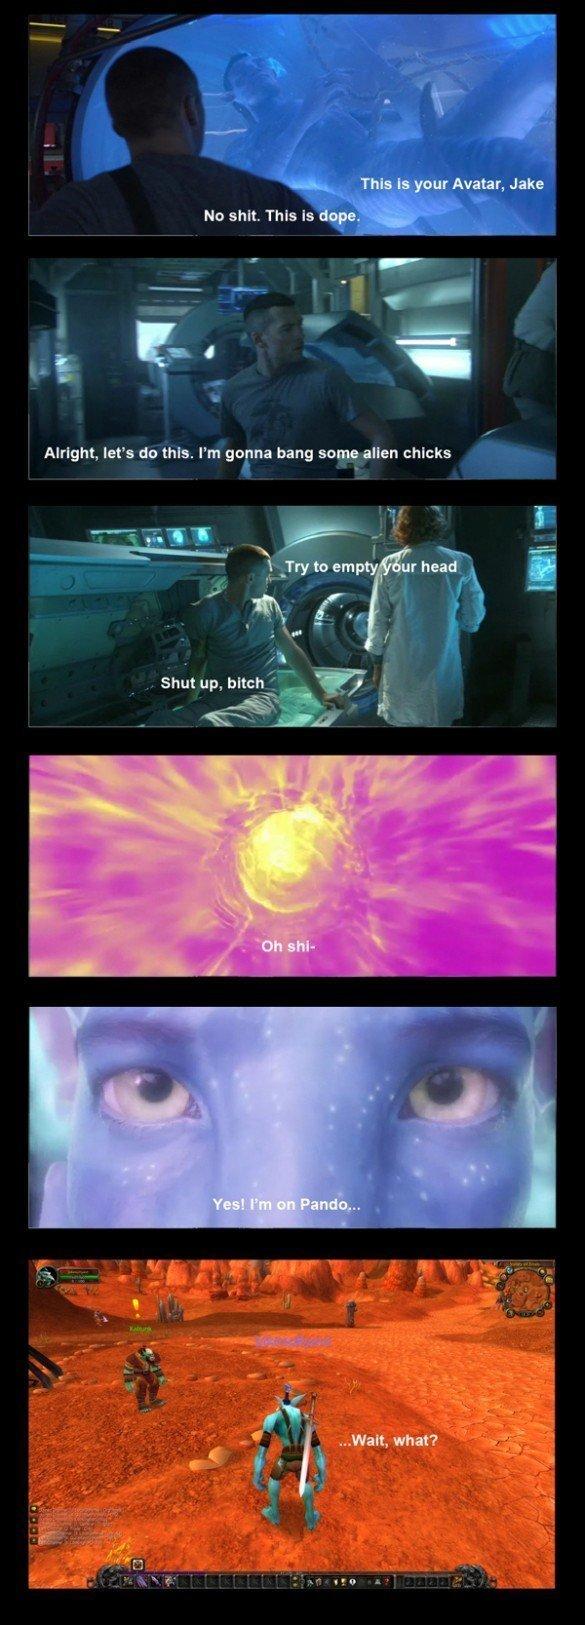 Avatar. .. she trolled him hard Avatar she trolled him hard